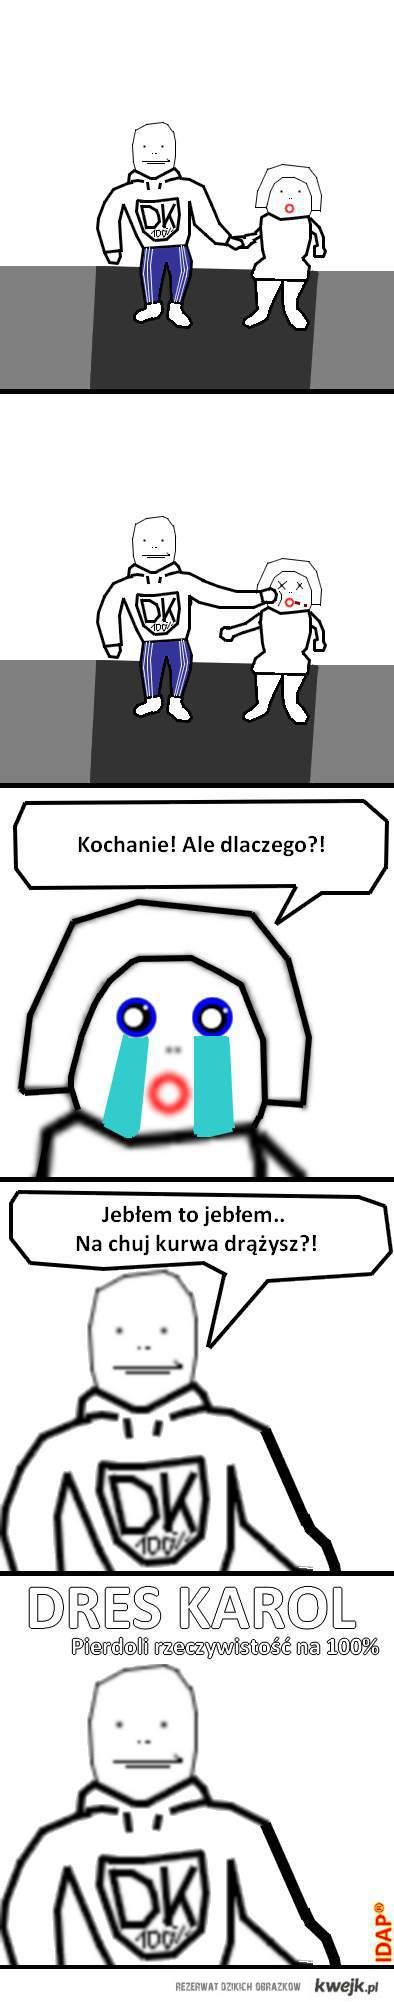 Dres Karol cz. 1